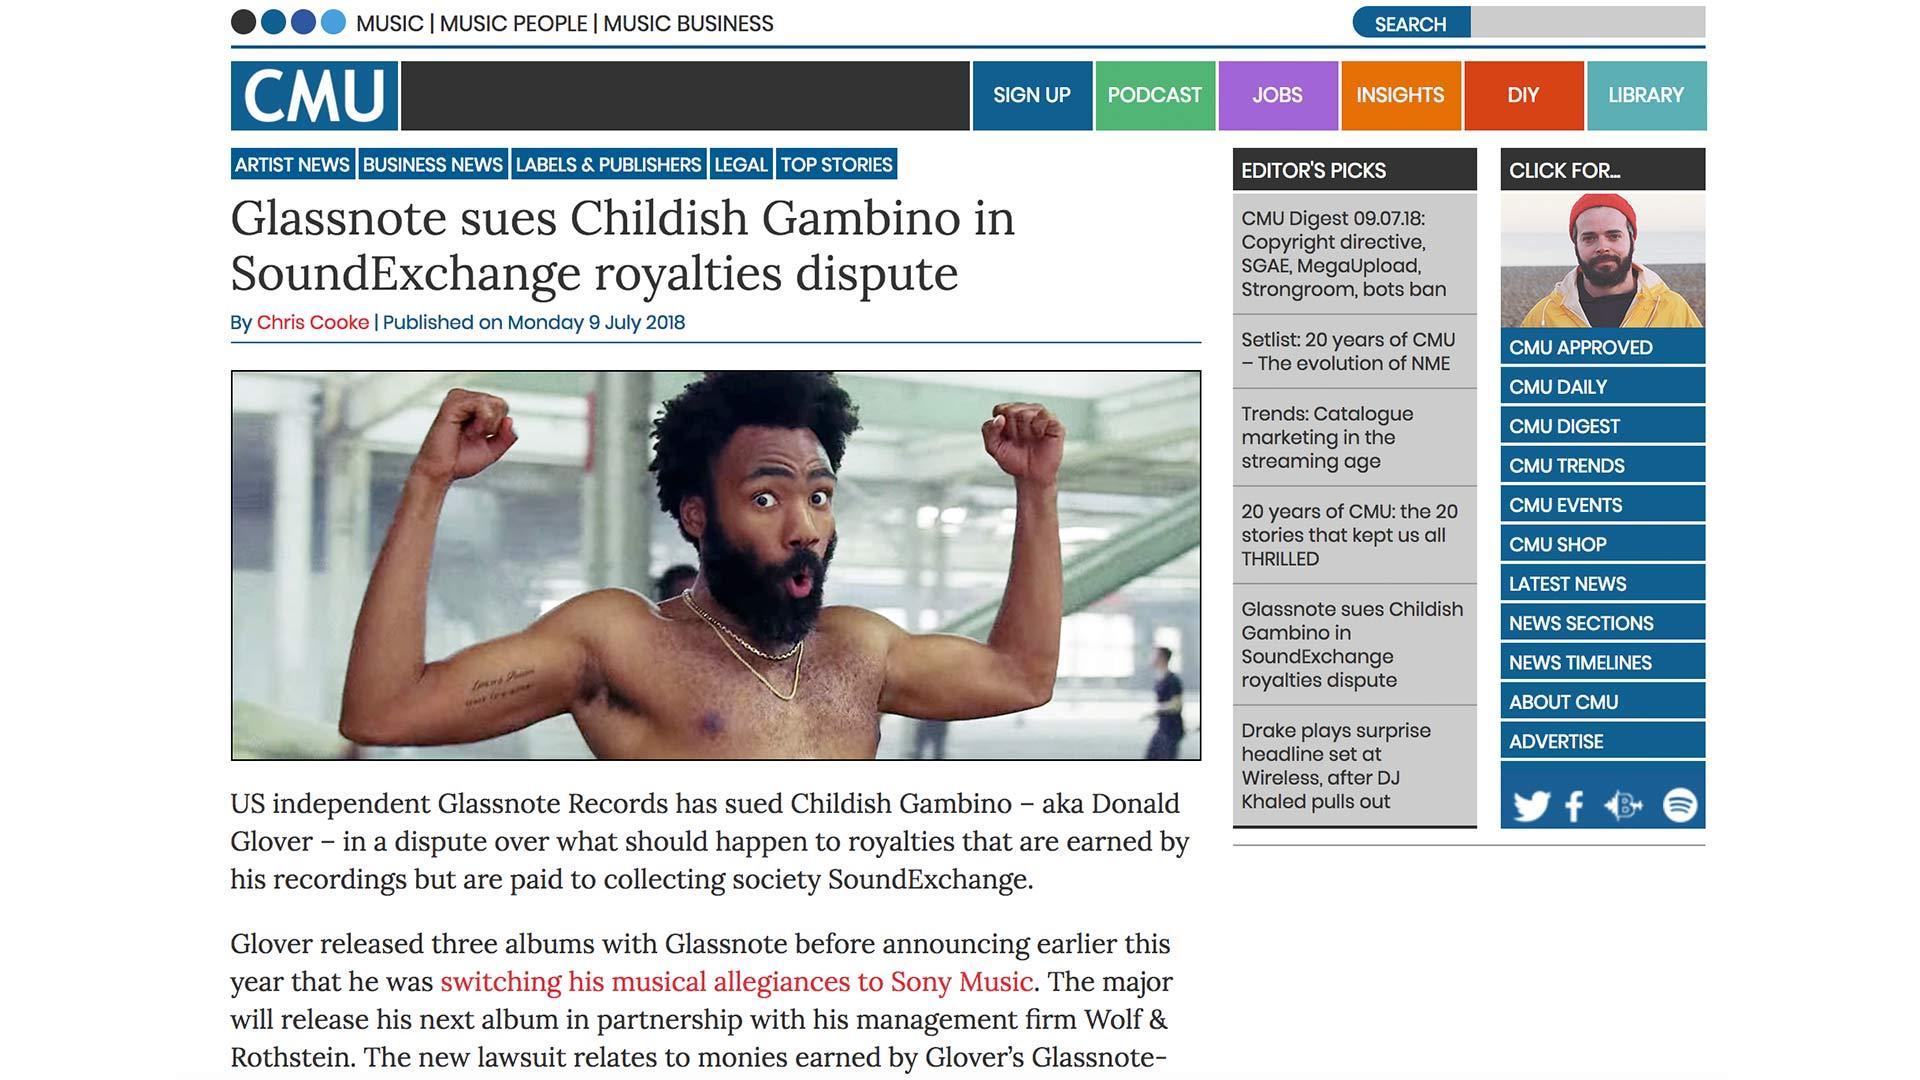 Fairness Rocks News Glassnote sues Childish Gambino in SoundExchange royalties dispute